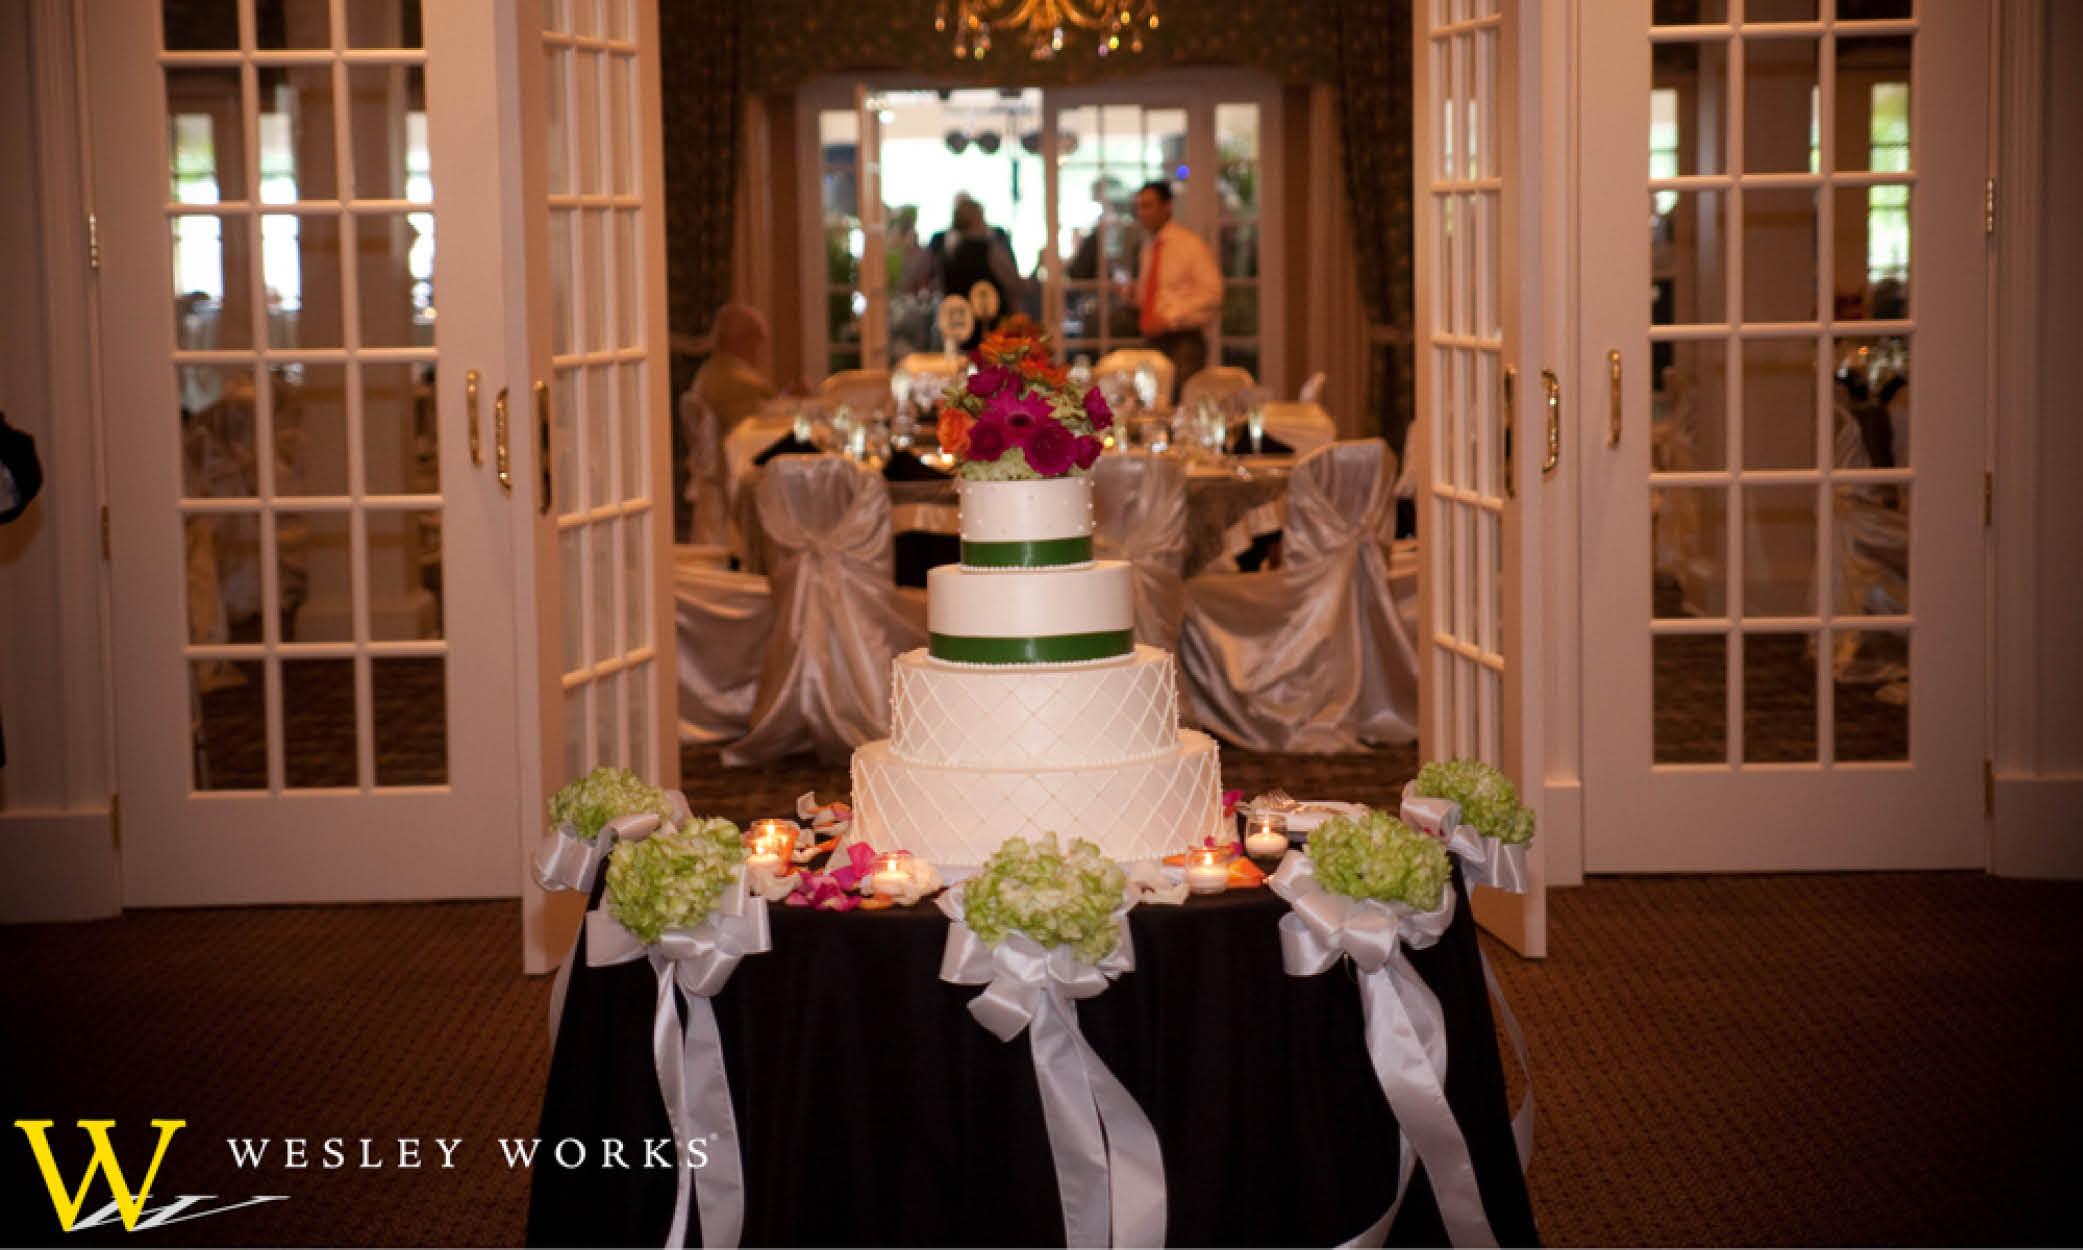 Lehigh Valley Wedding and Reception Sites   Wesley Works   DJ ...